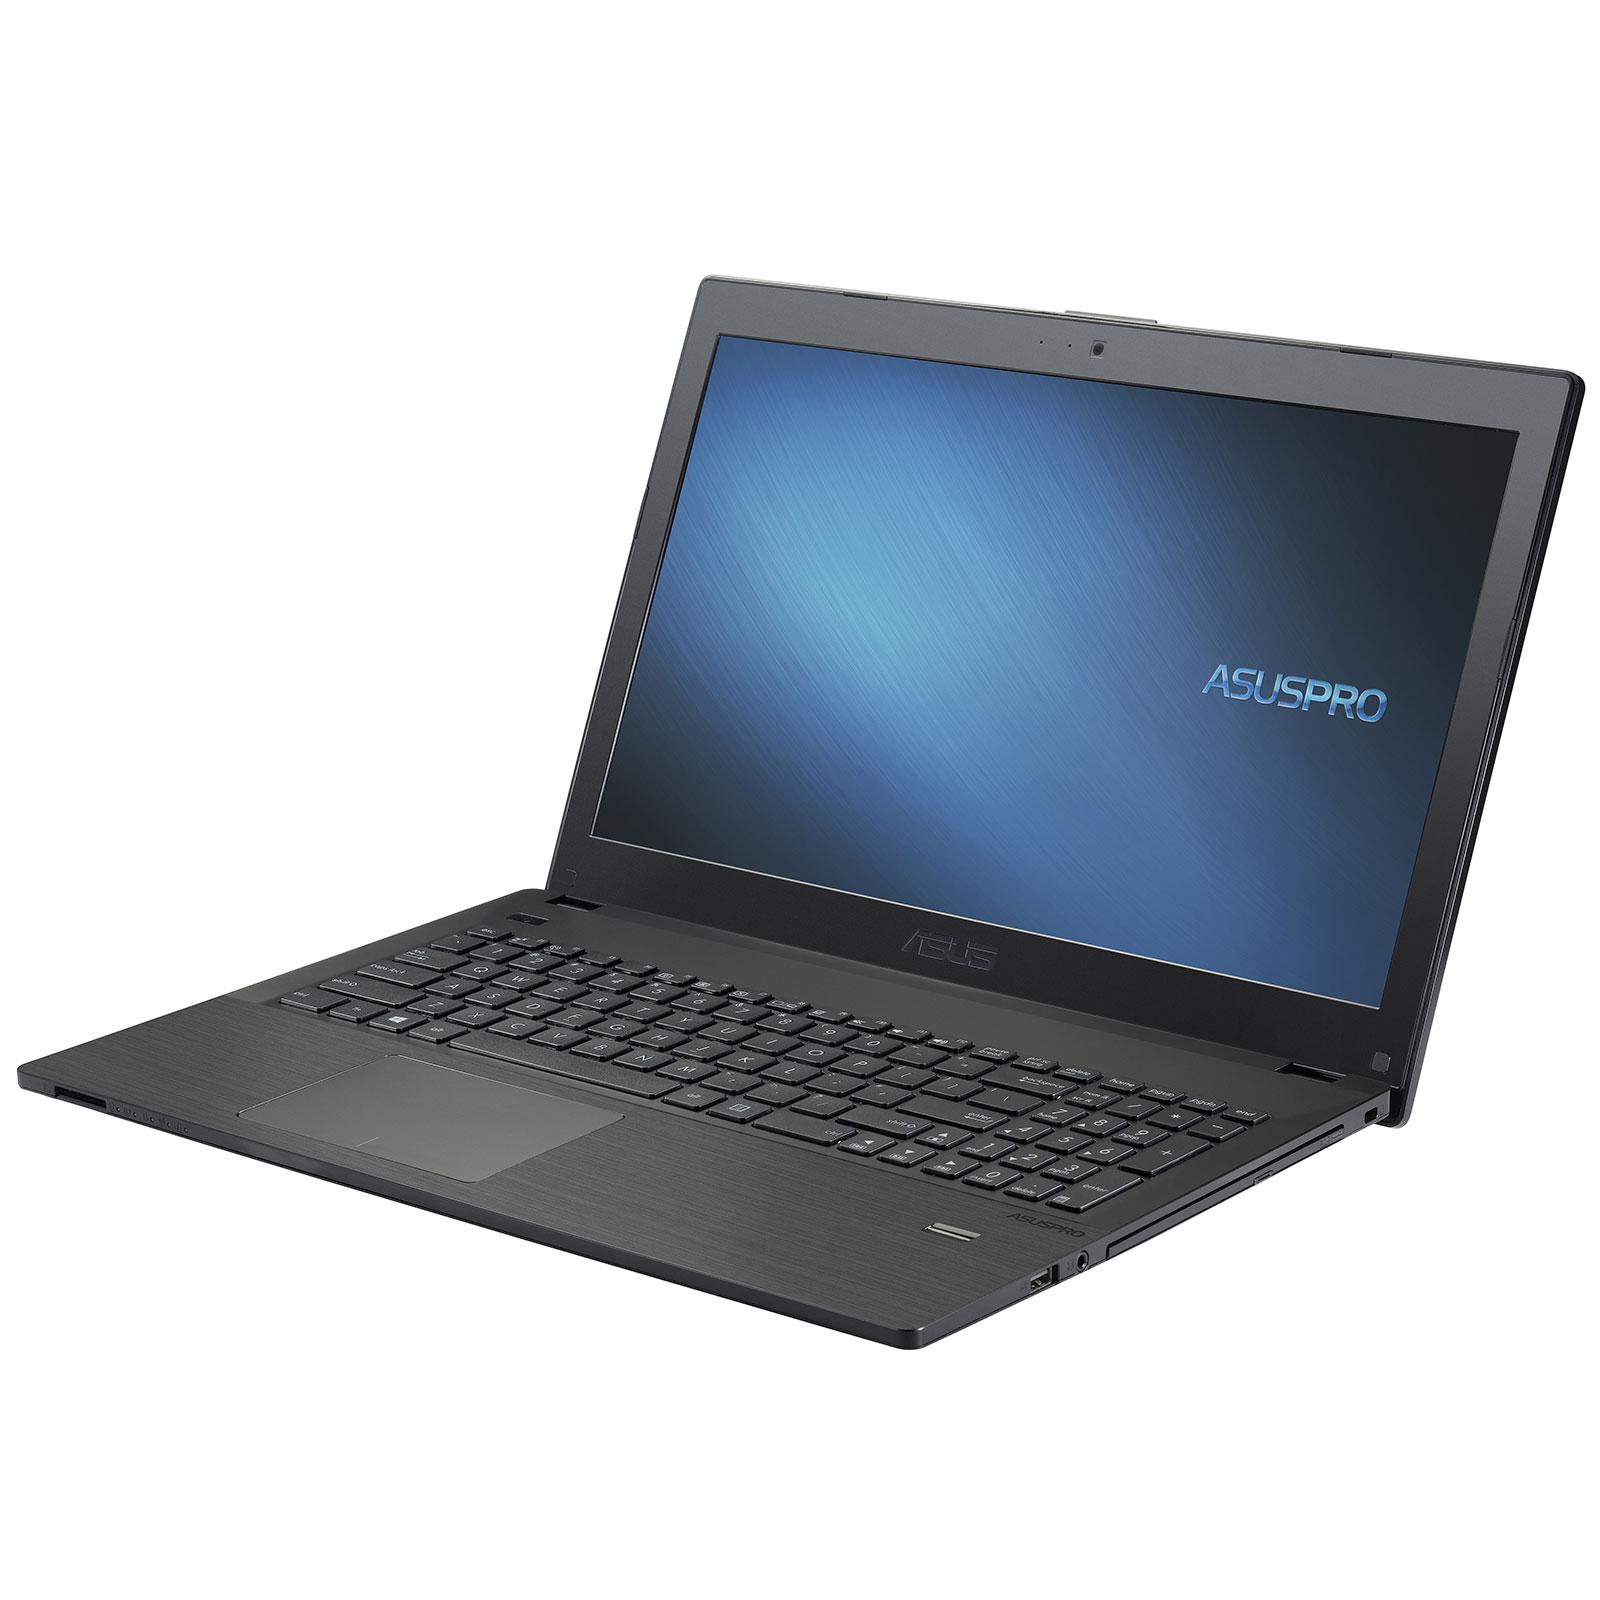 Asus 90NX0051-M13020 - PC portable Asus - Cybertek.fr - 2